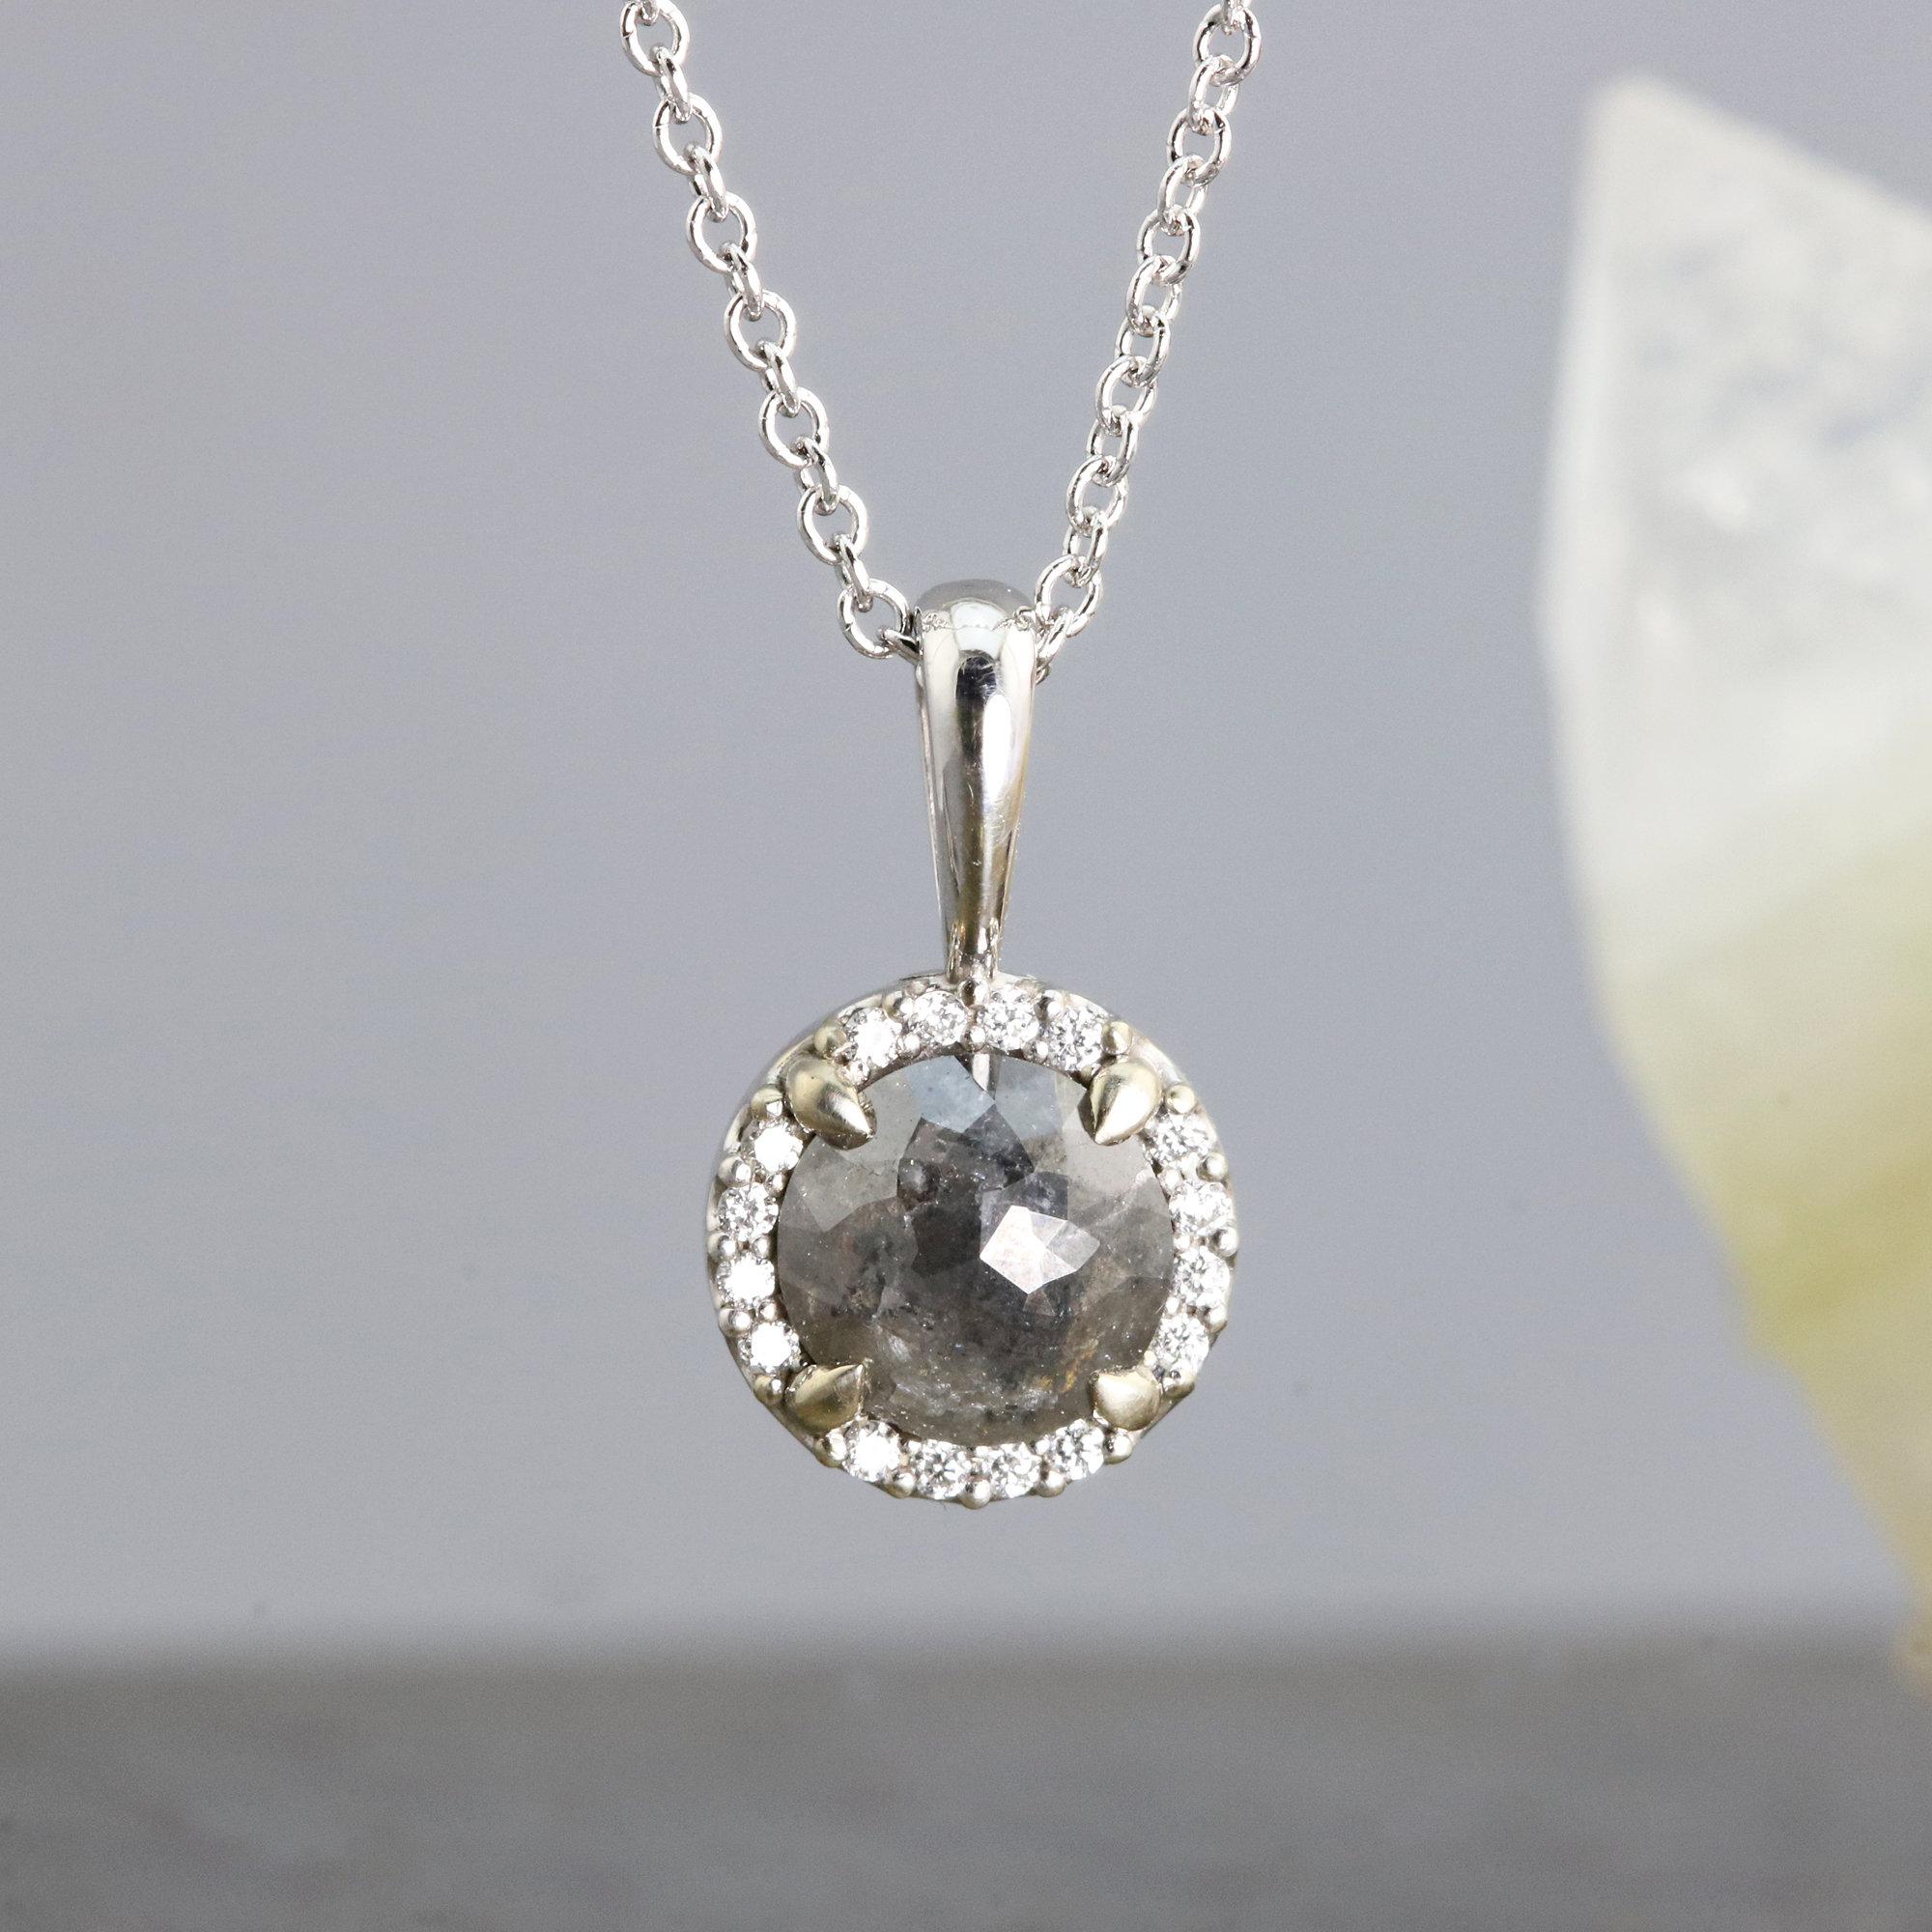 Dark Gray Rose Cut Diamond Pendant Necklace By Sarah Hood